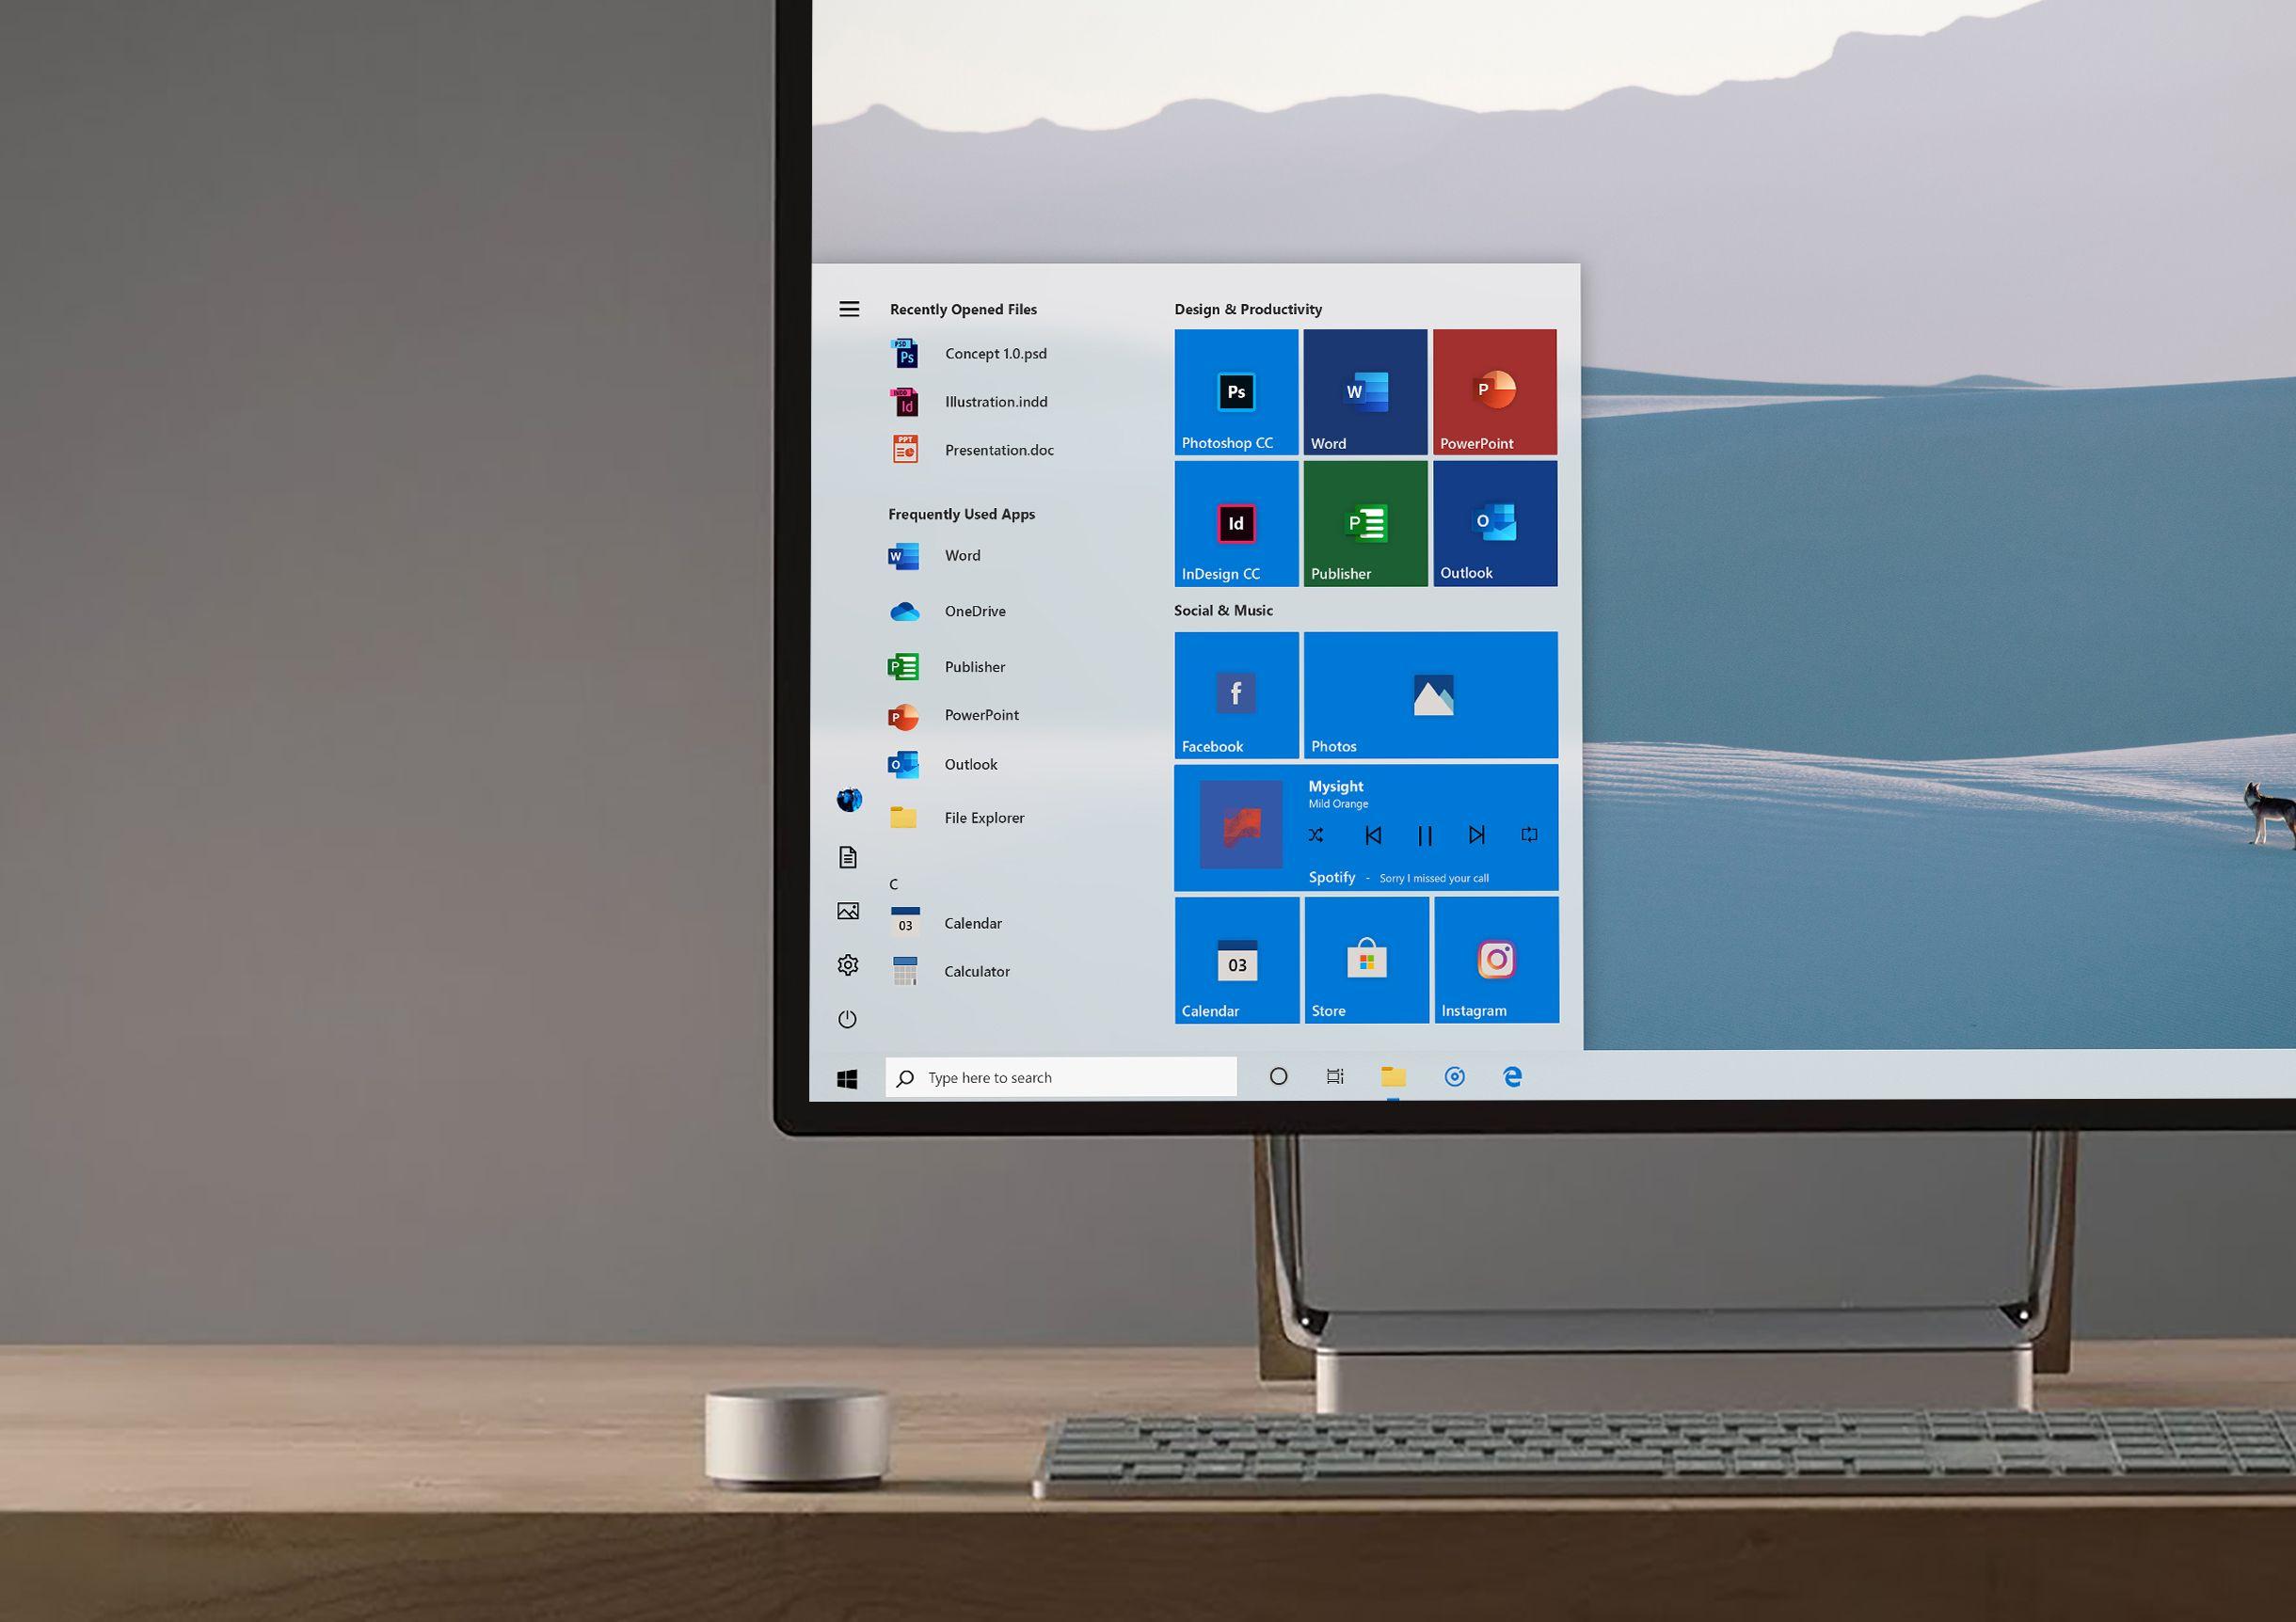 New Windows 10 Start menu Microsoft shows this new design